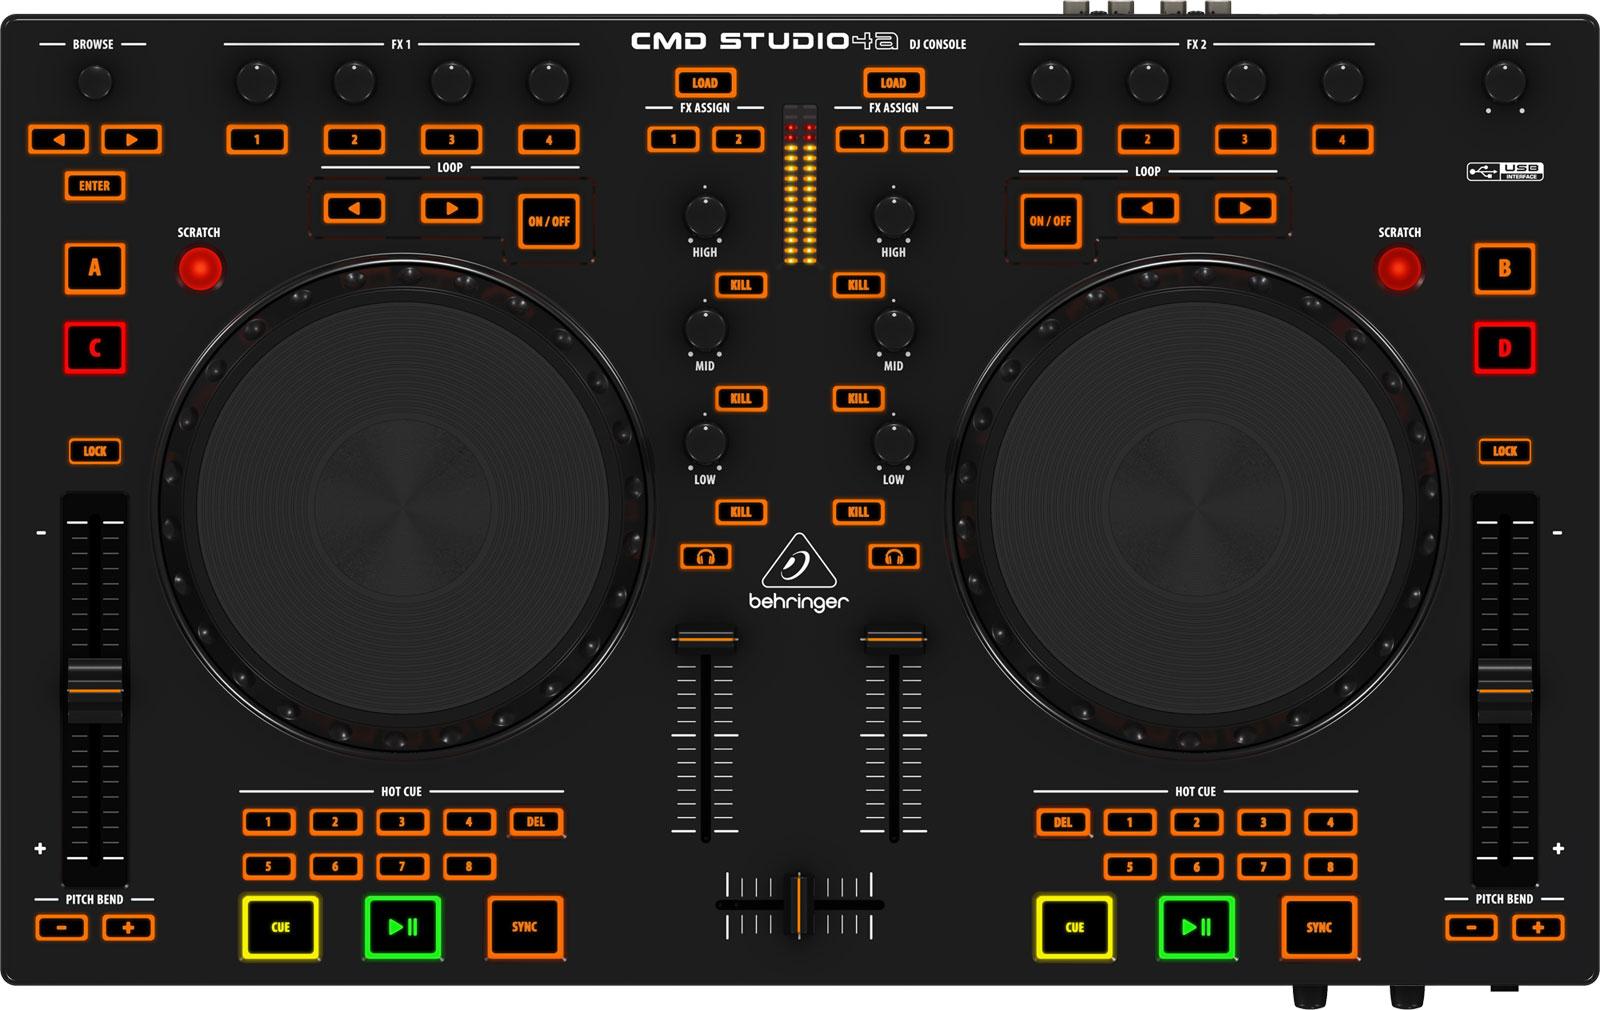 Midi Deck Controller Controller 4-deck dj Midi